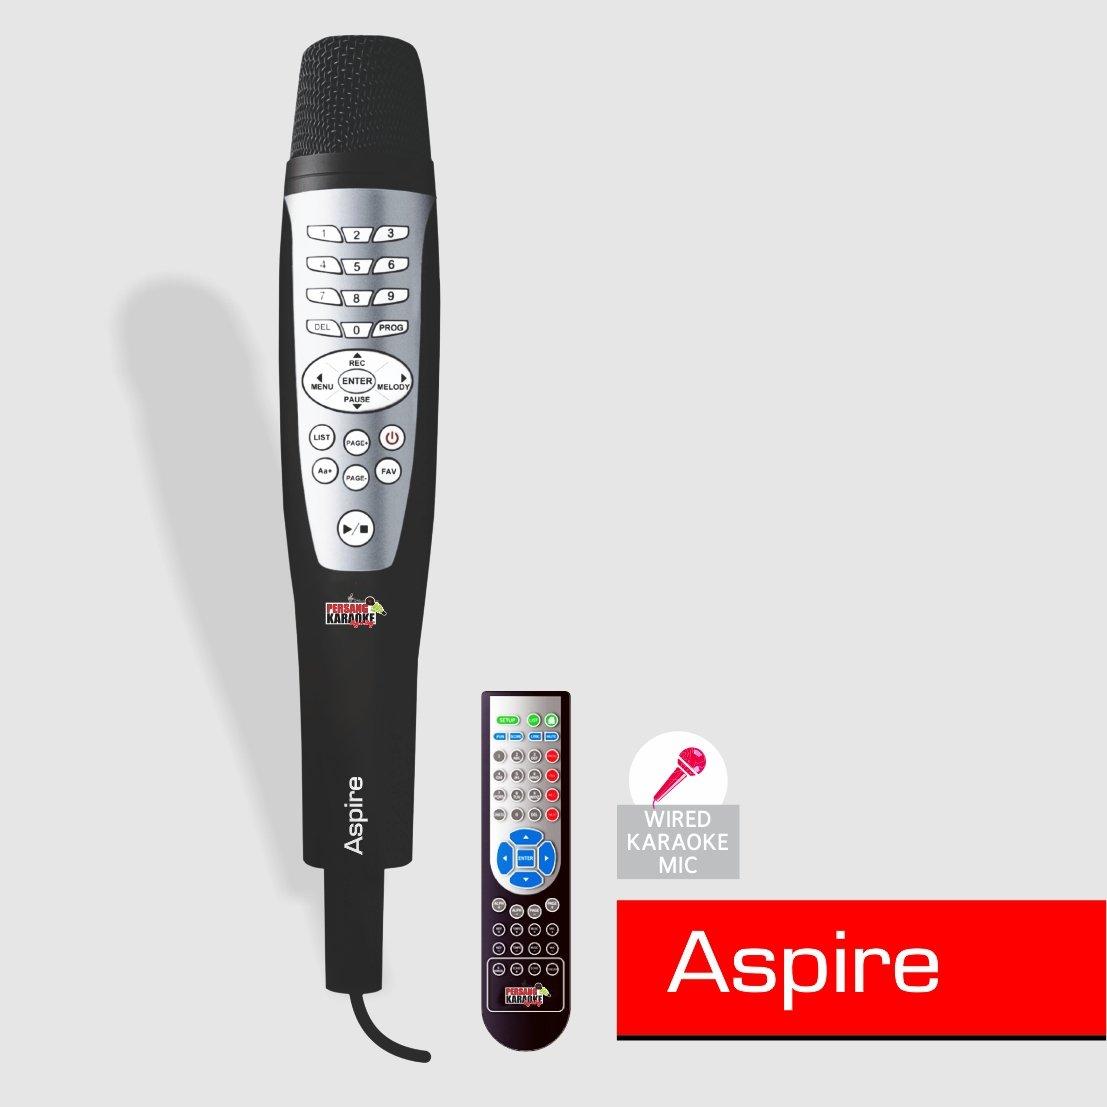 Persang Karaoke Aspire PK-8165 Karaoke System with Remote